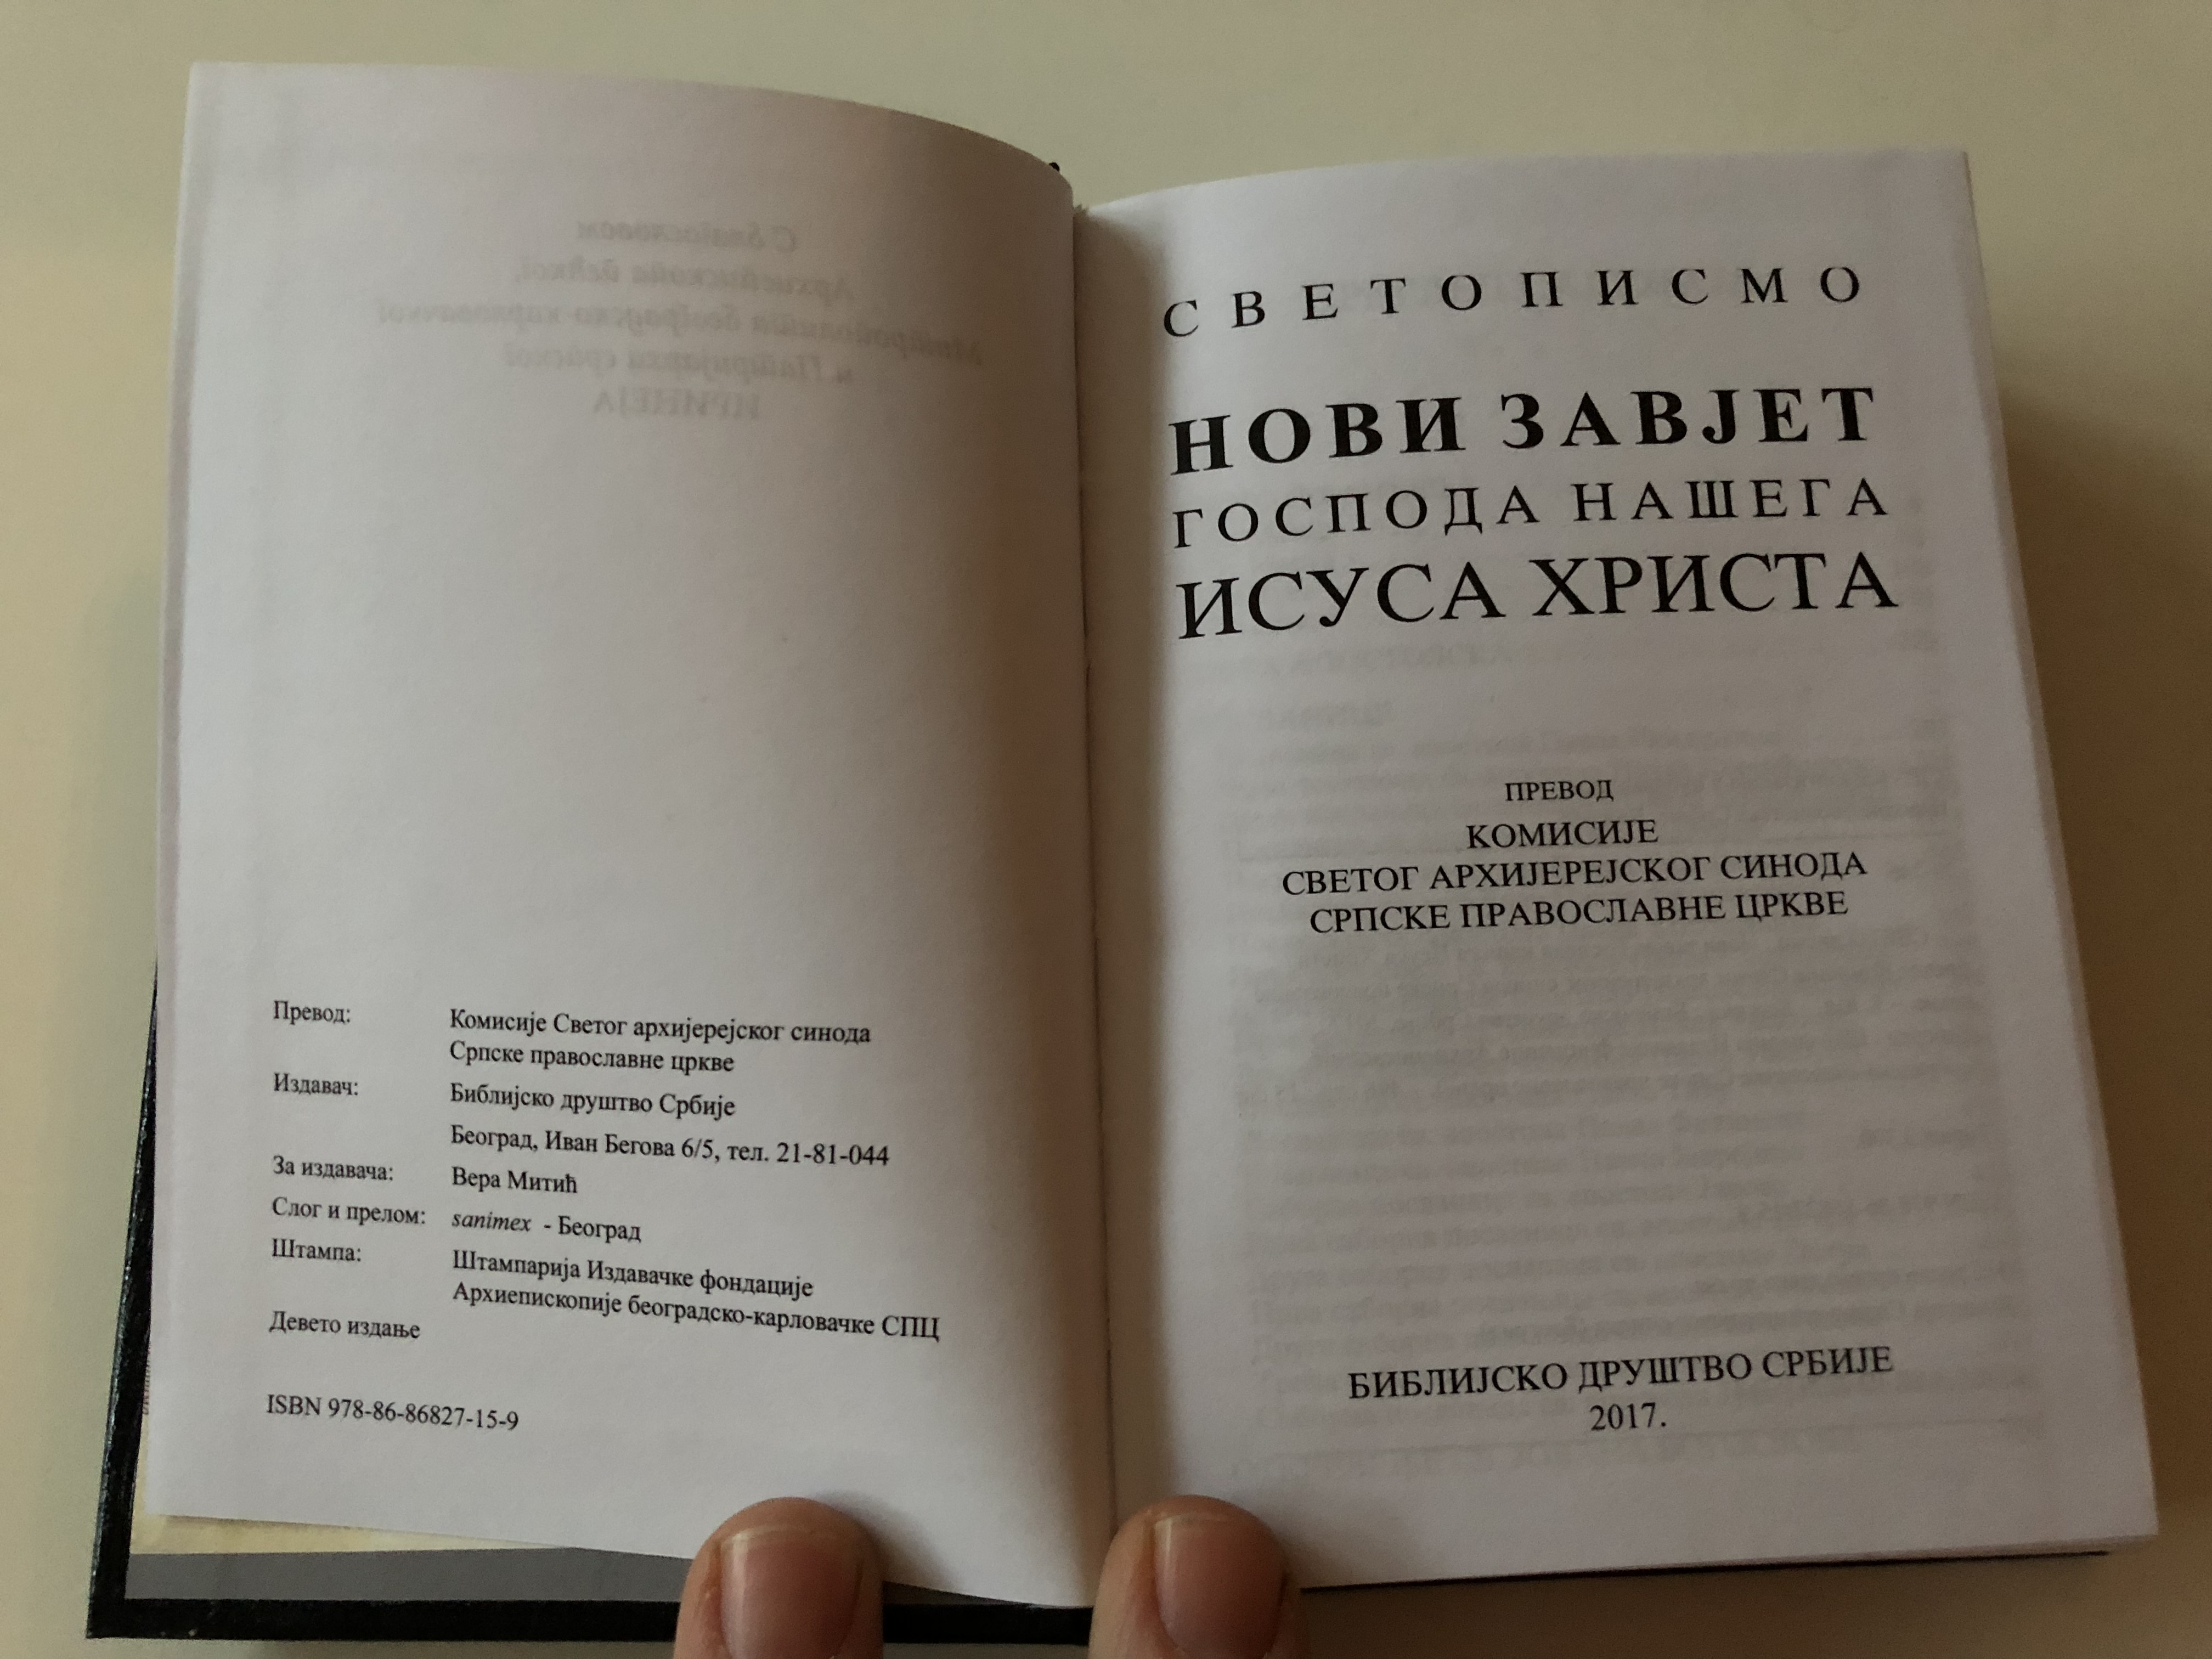 serbian-nt-black-synodal-2017-bible-society-5-.jpg